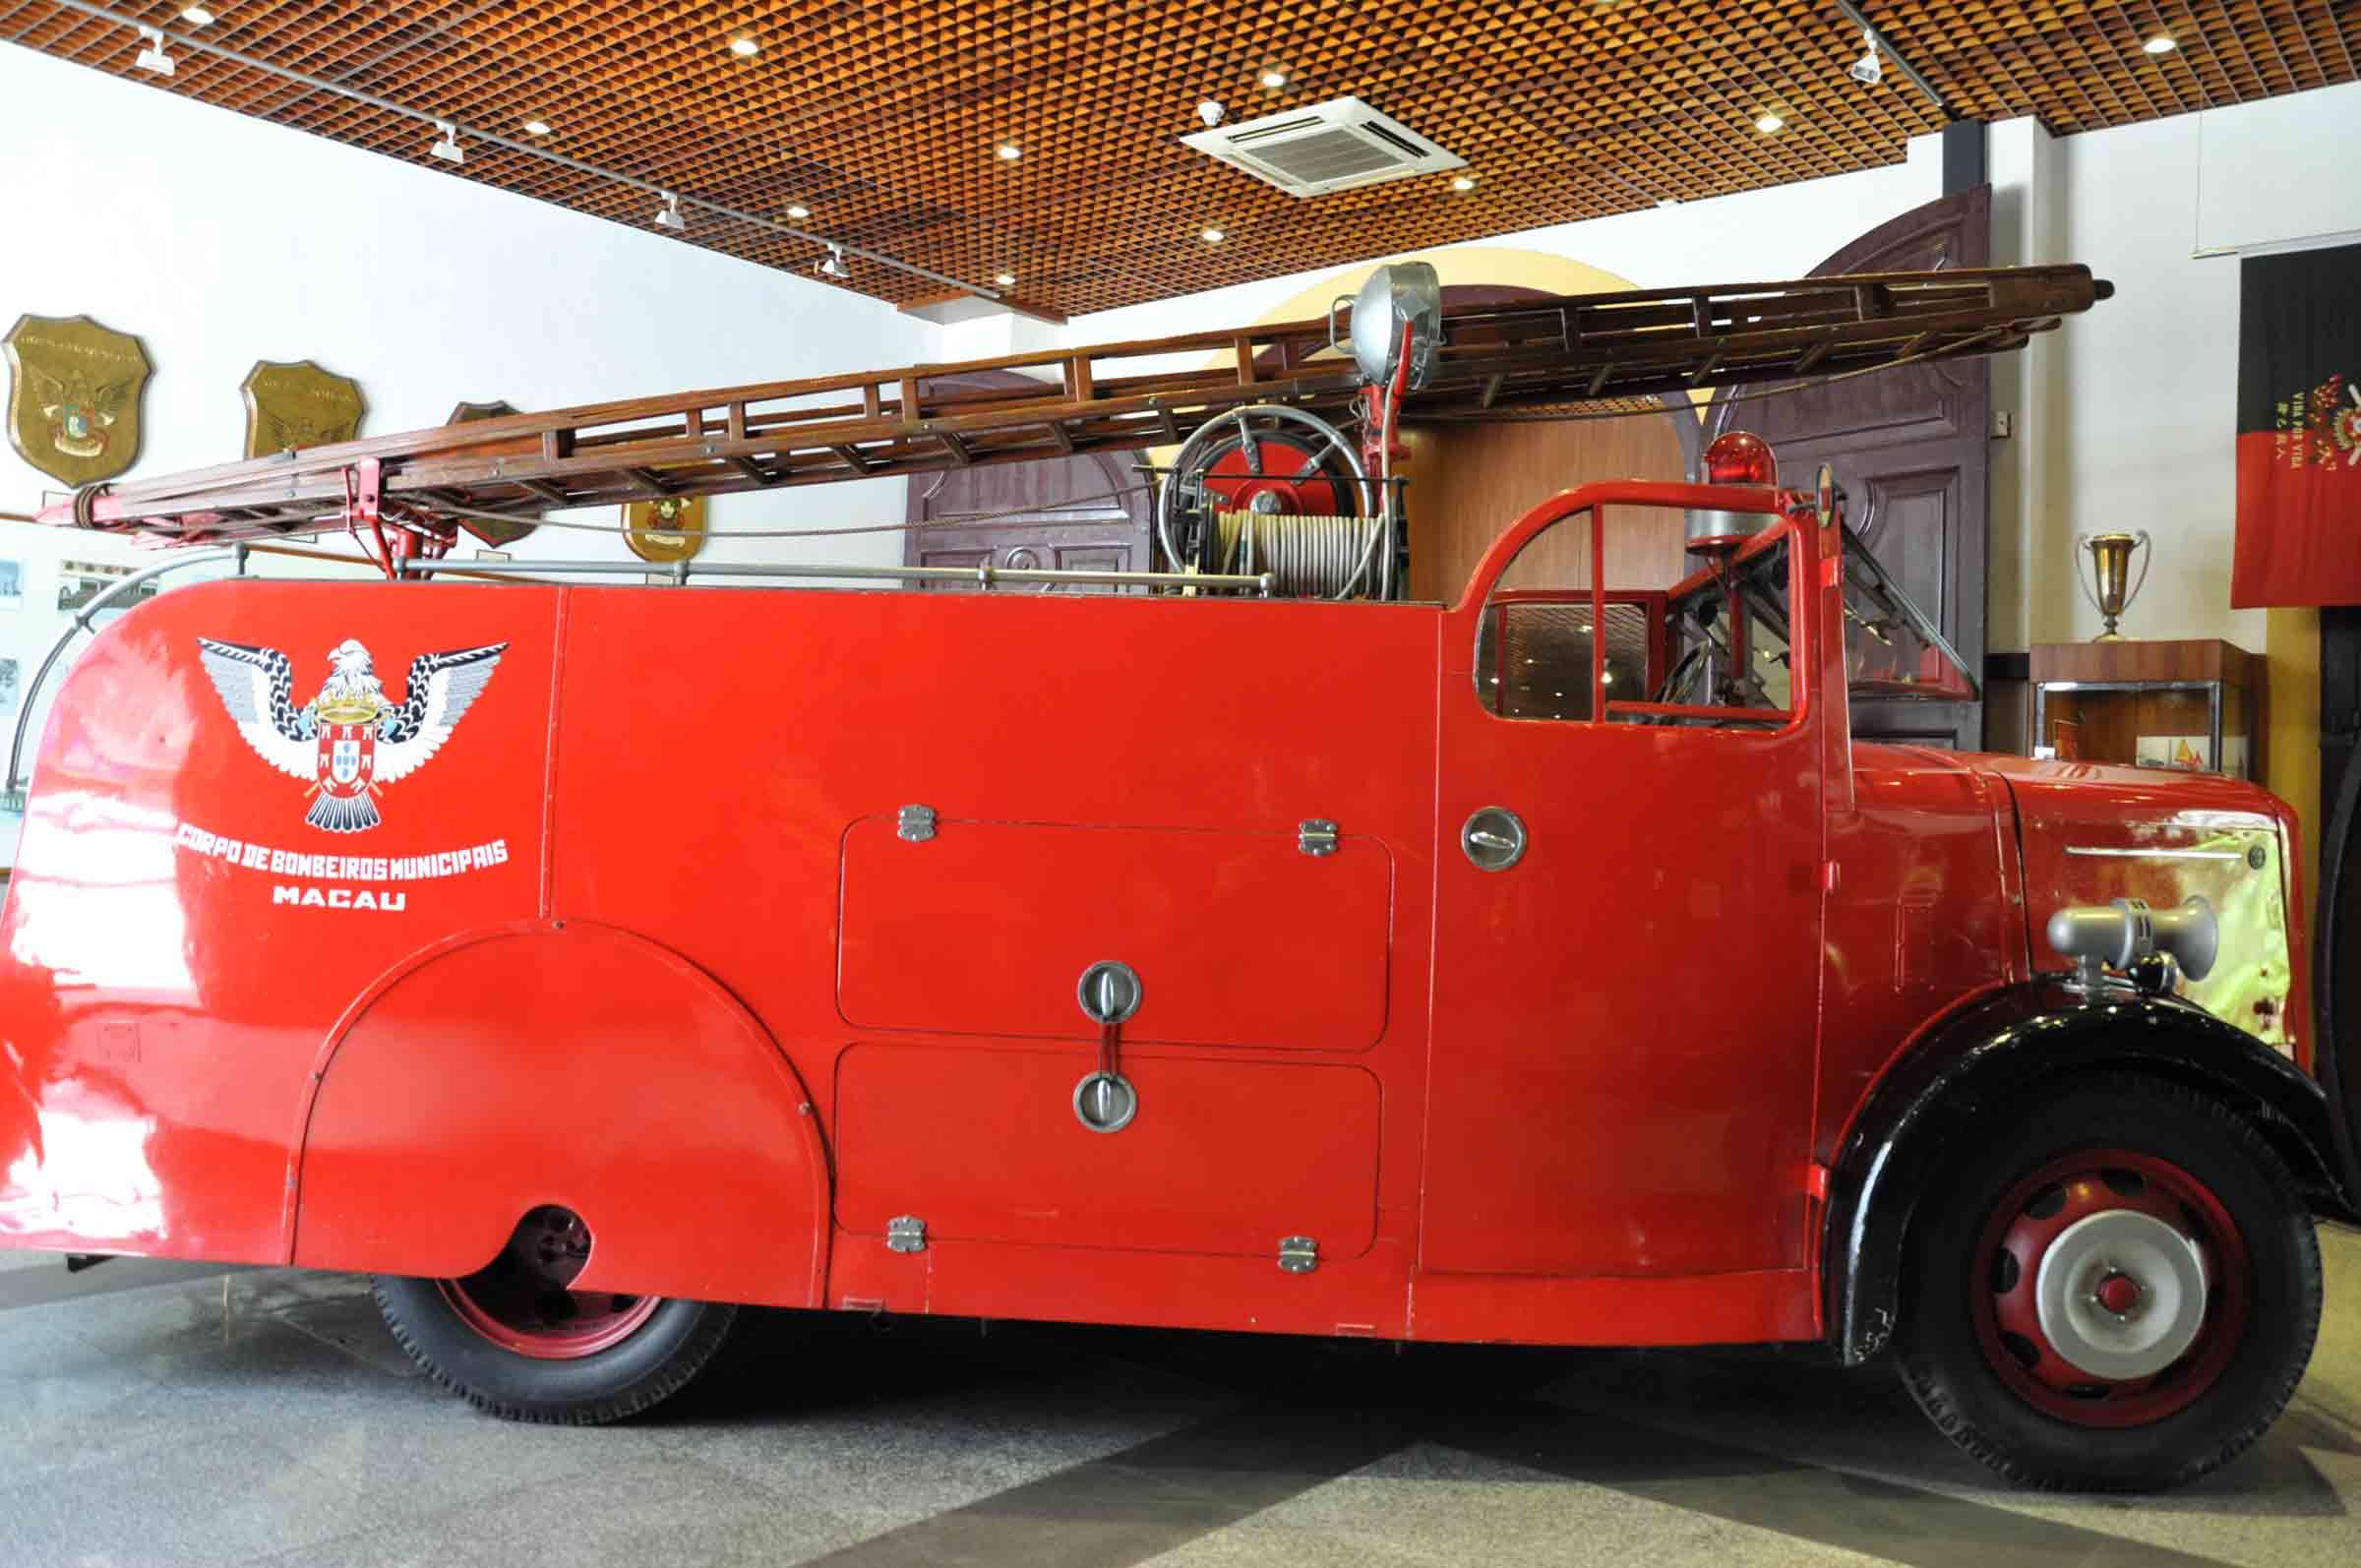 Fire Services Museum fire truck